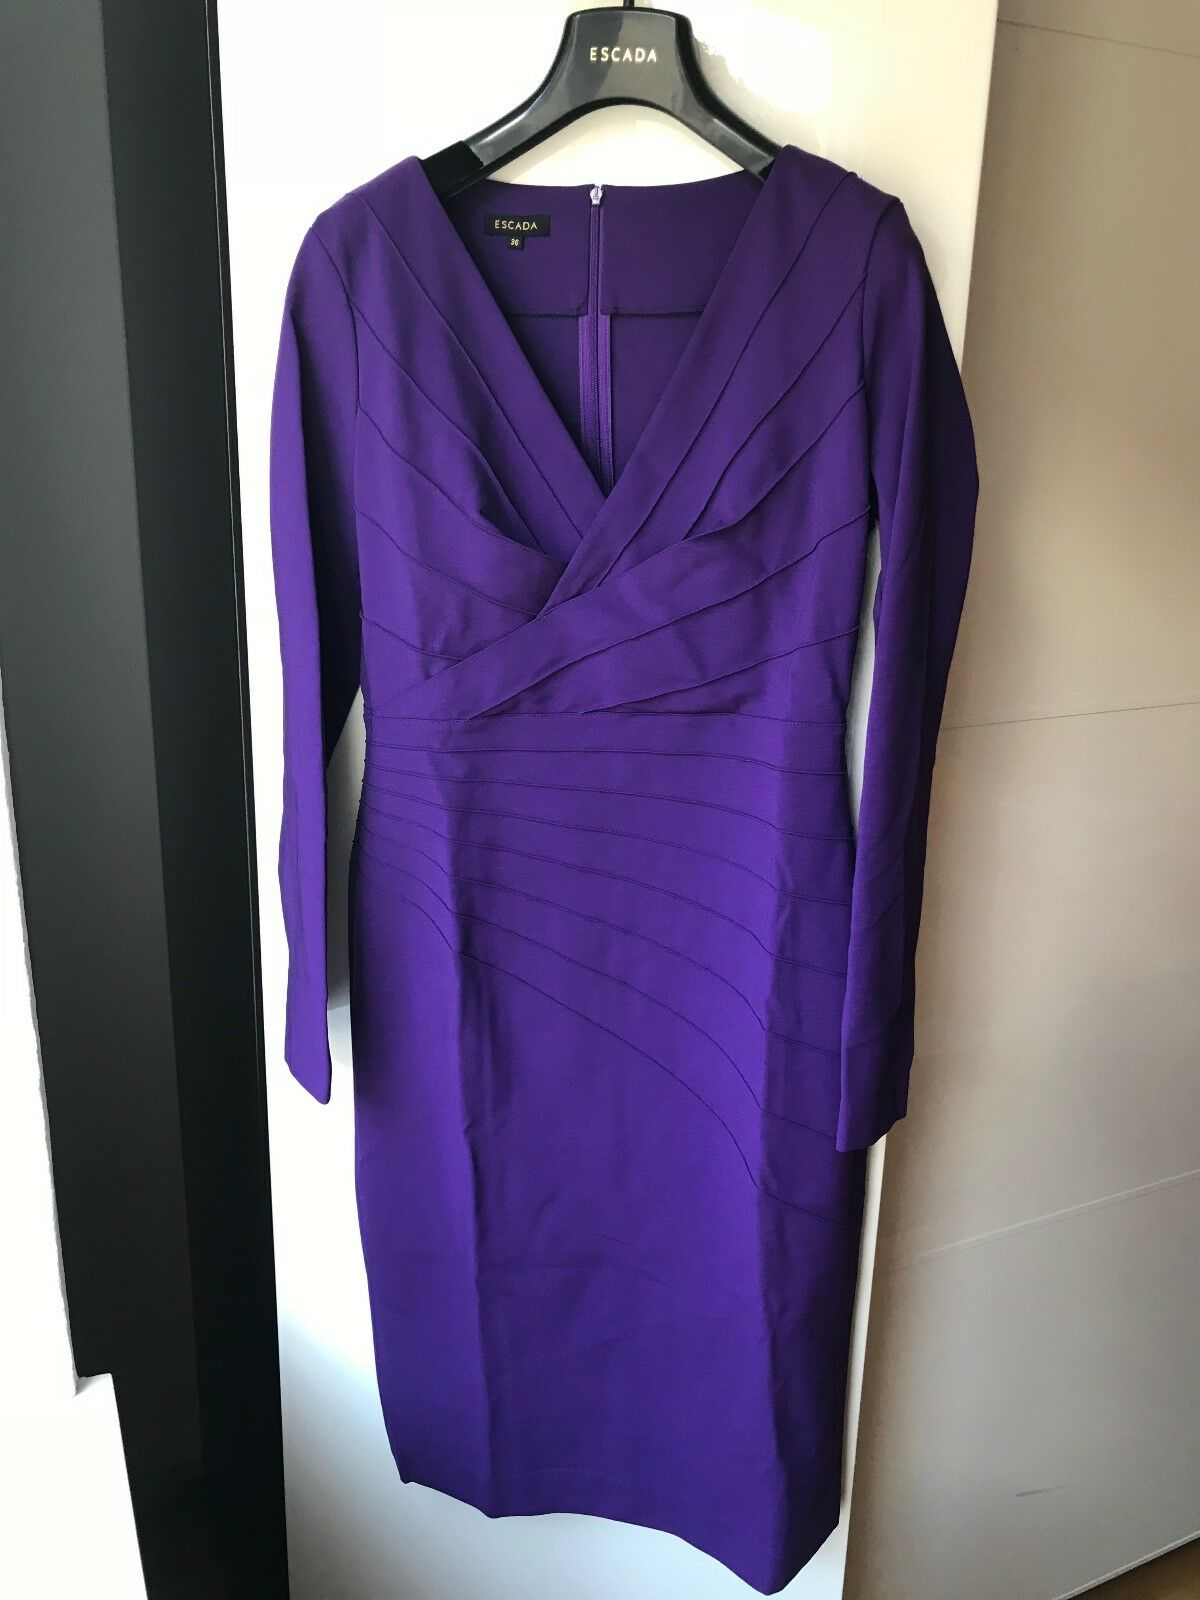 ESCADA Kleid - dunkel lilat - - - Größe 36 - NEU ab5918